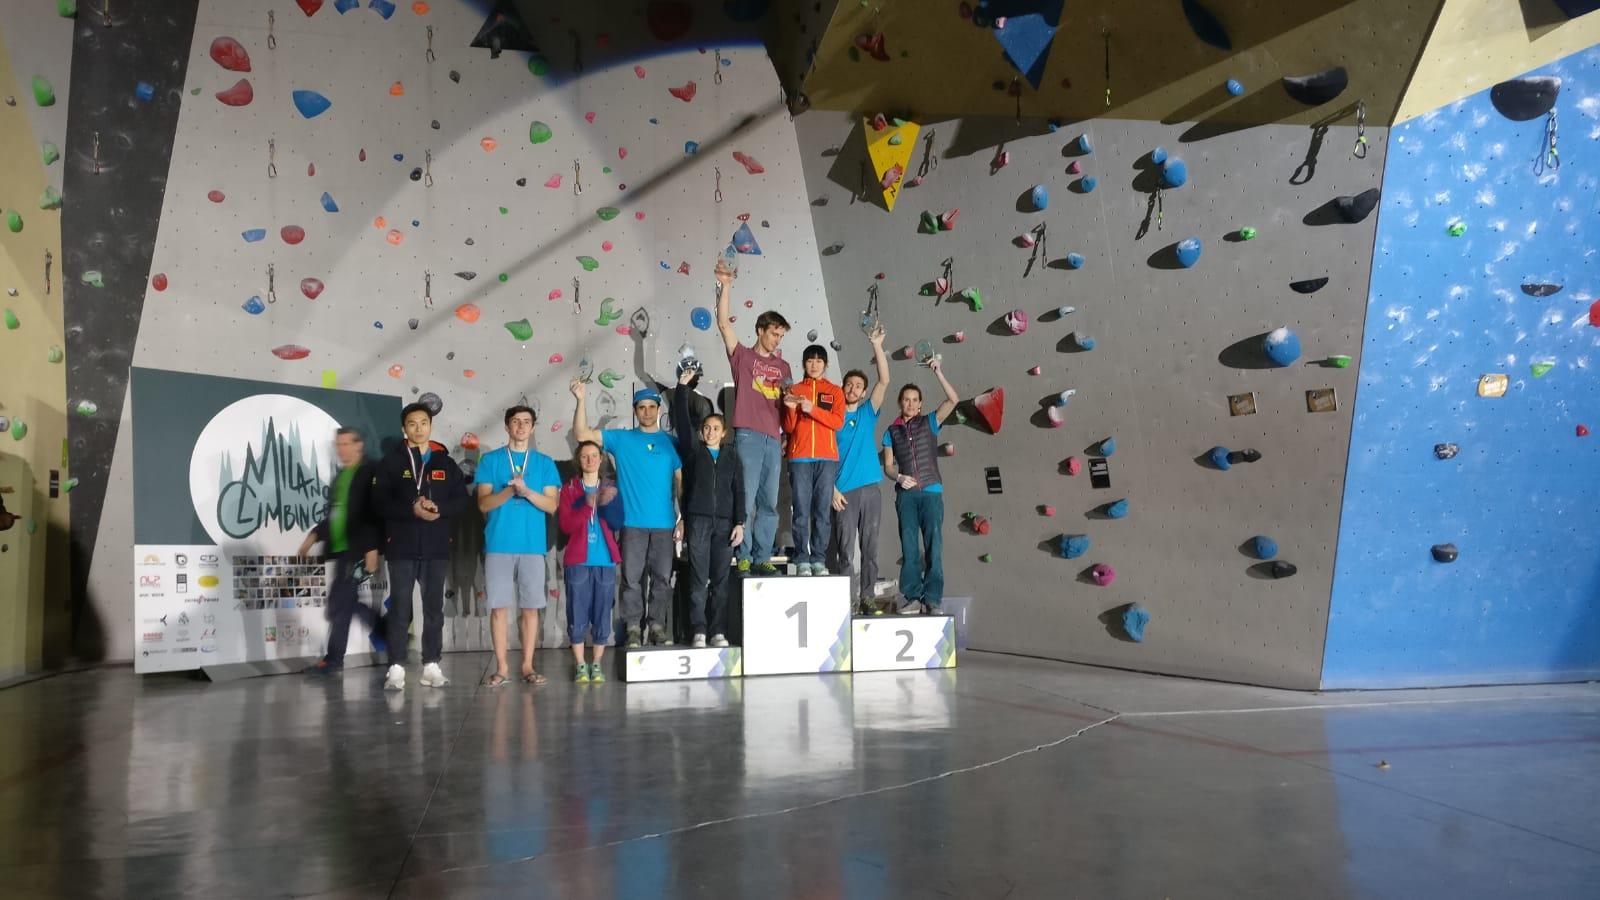 vincitori lead milano climbing expo urban wall